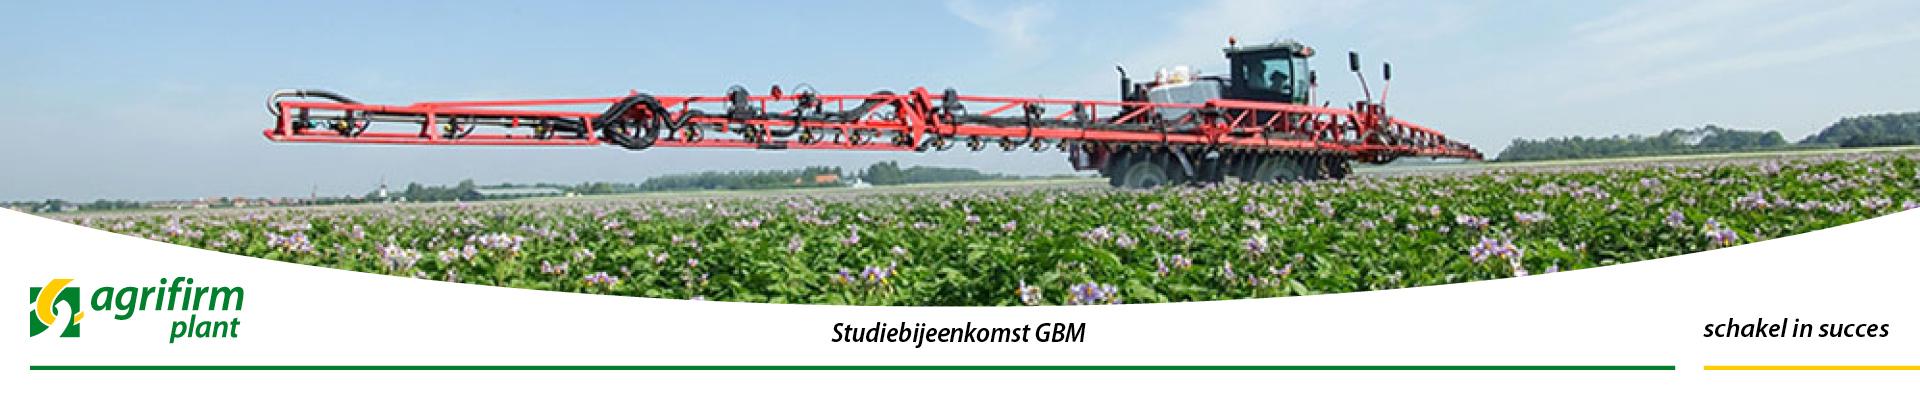 Studiebijeenkomst GBM in regio Friesland